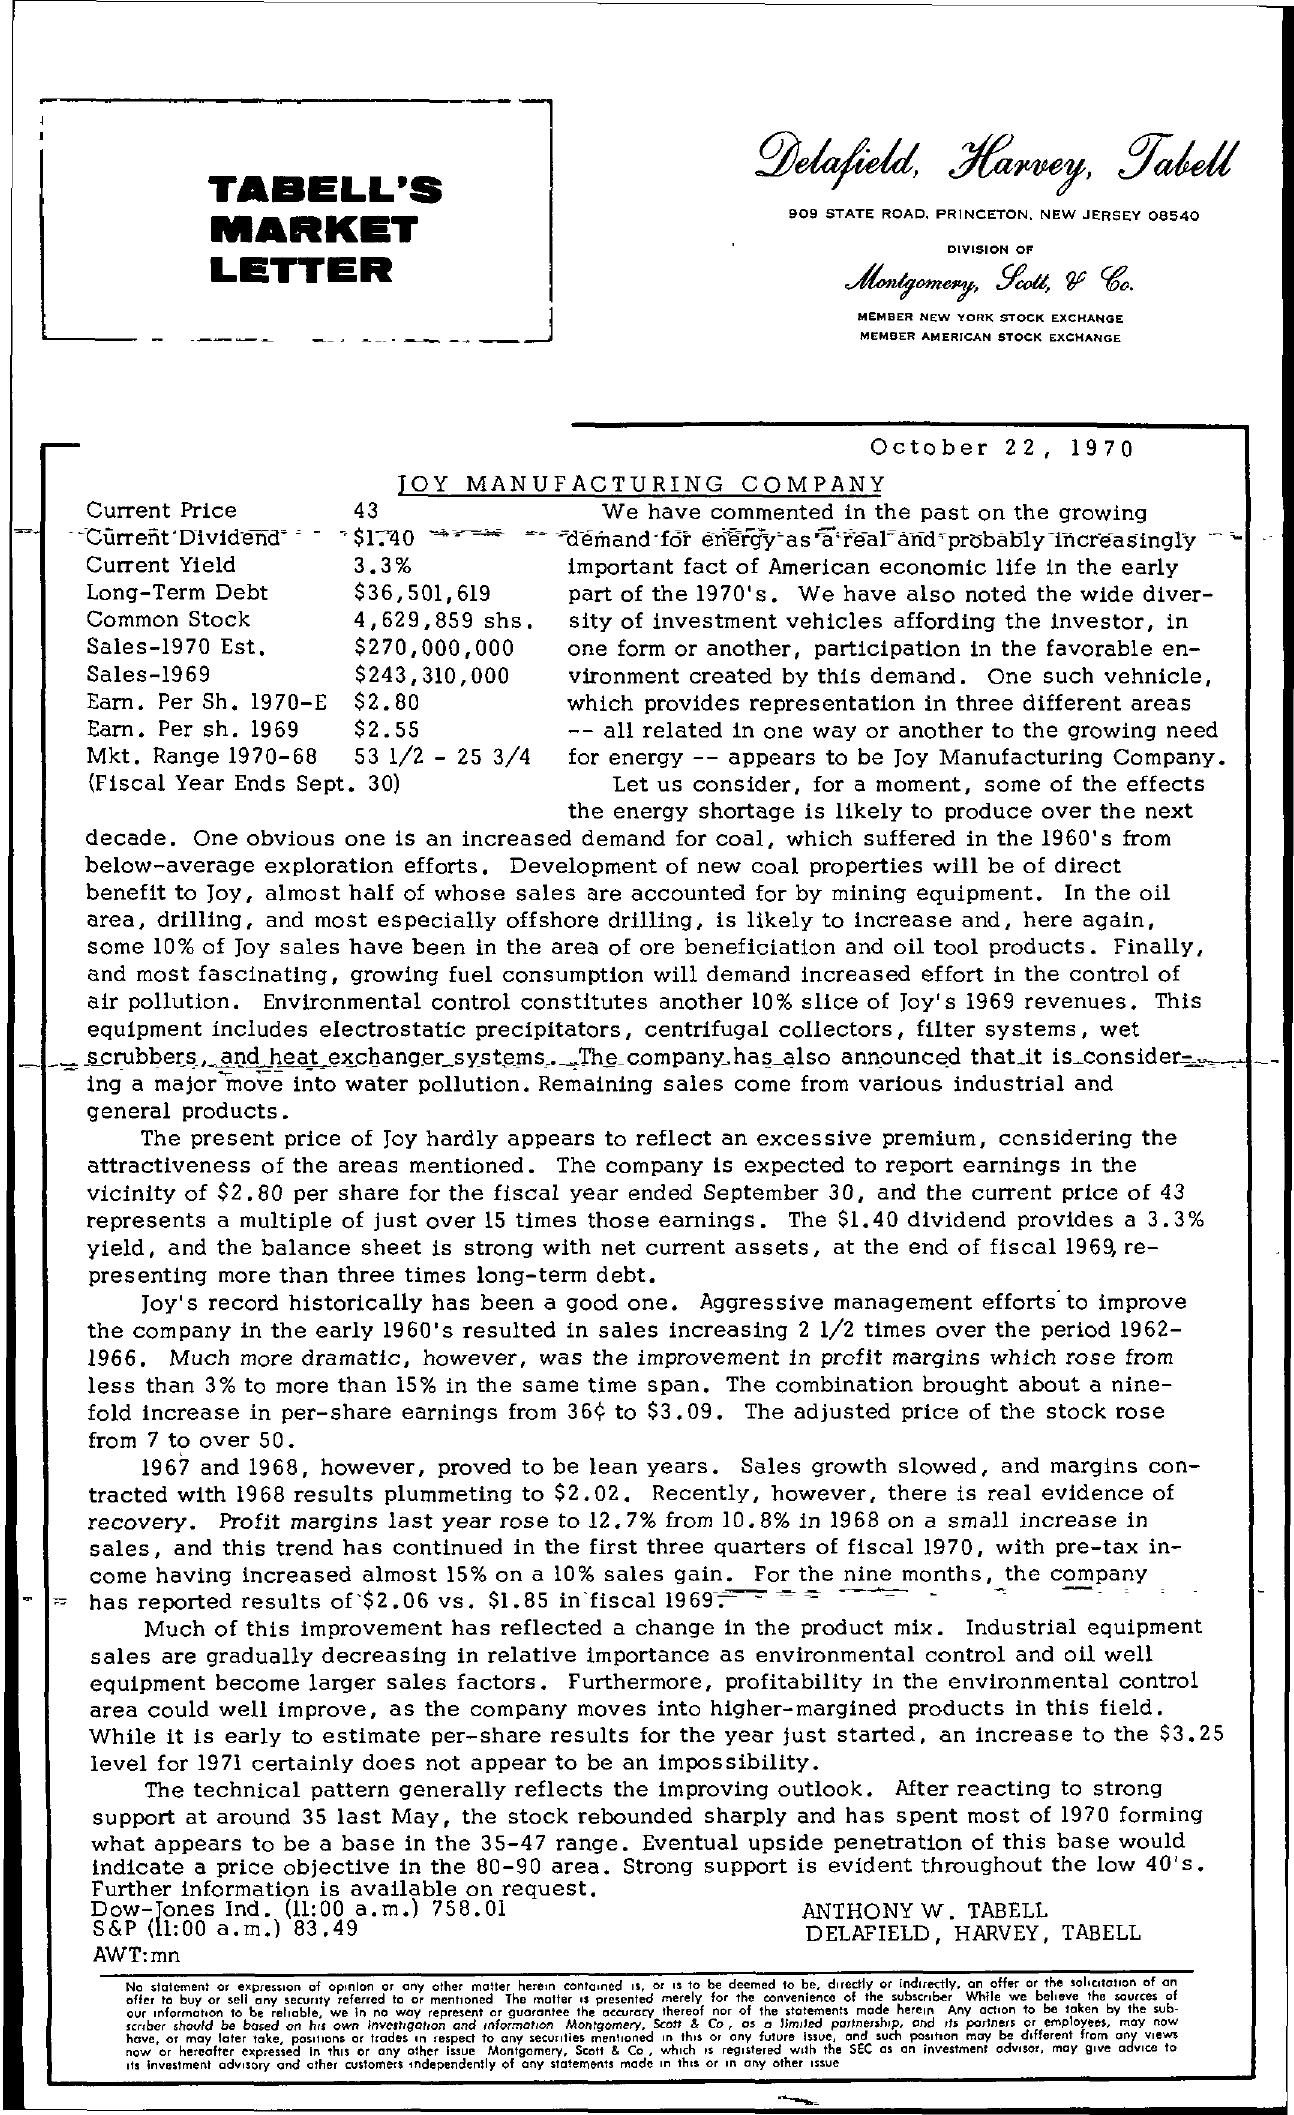 Tabell's Market Letter - October 22, 1970